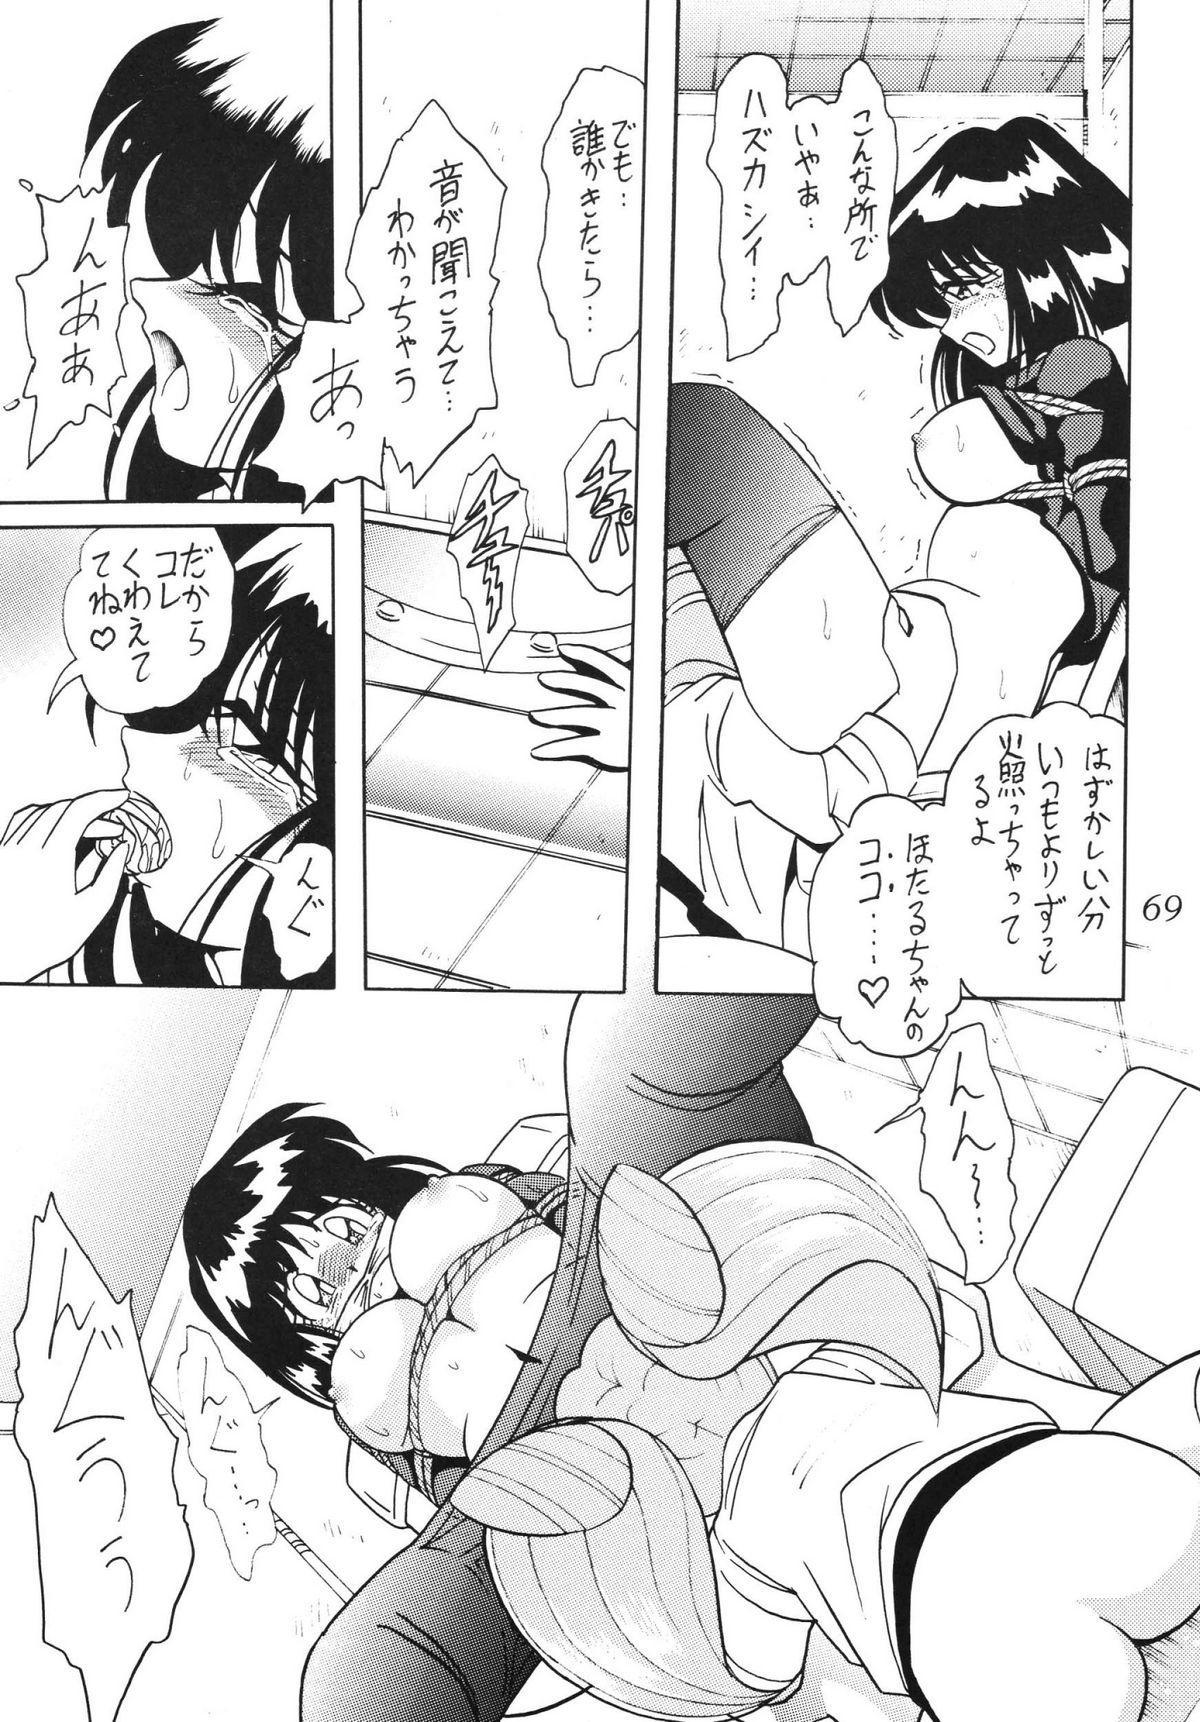 Silent Saturn SS vol. 5 68